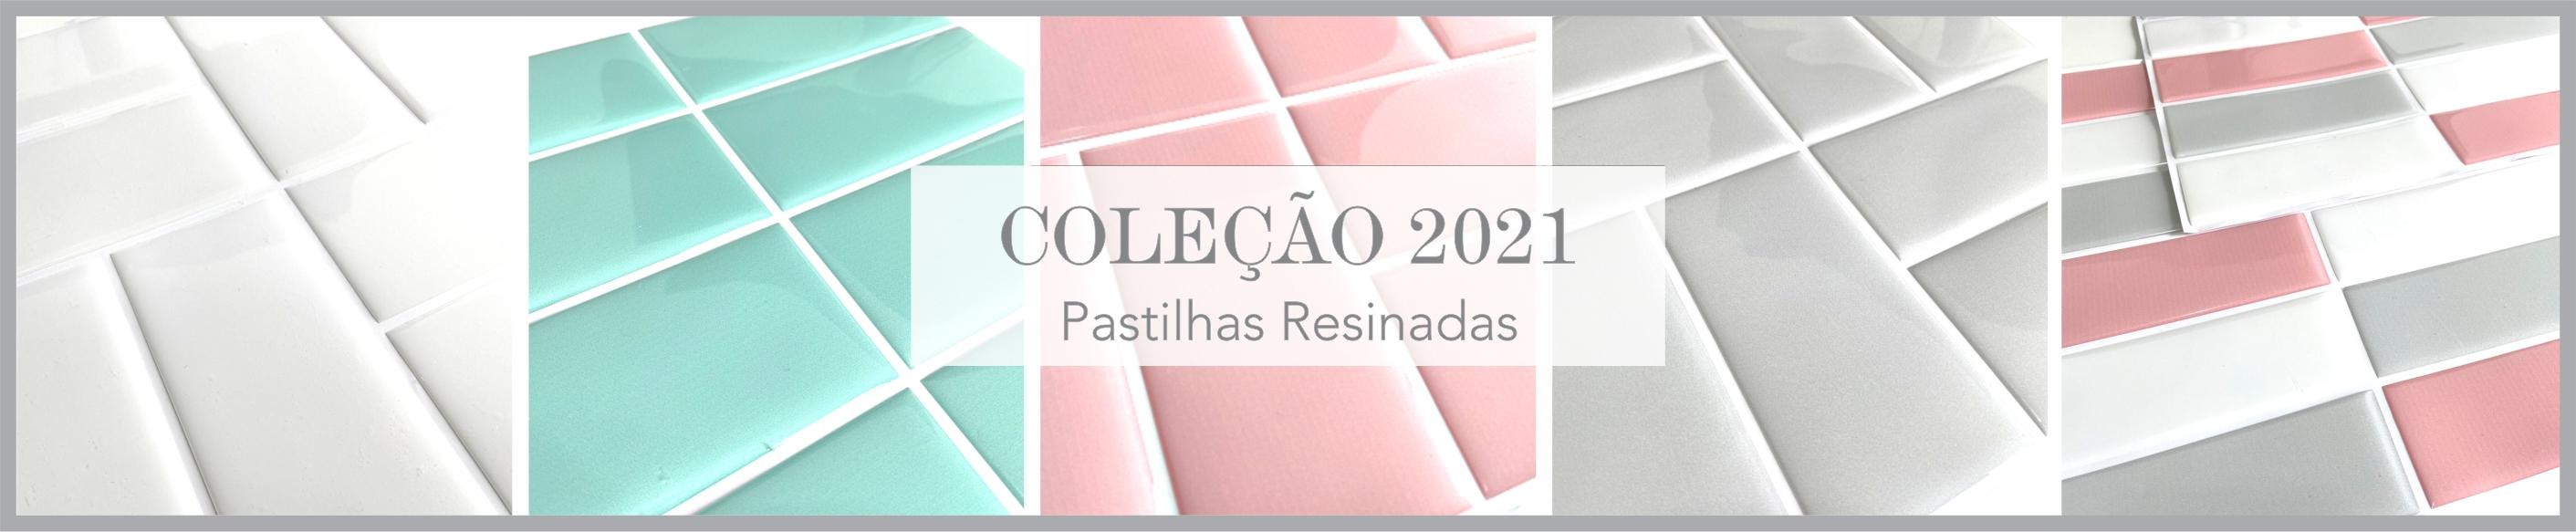 Pastilha 2021